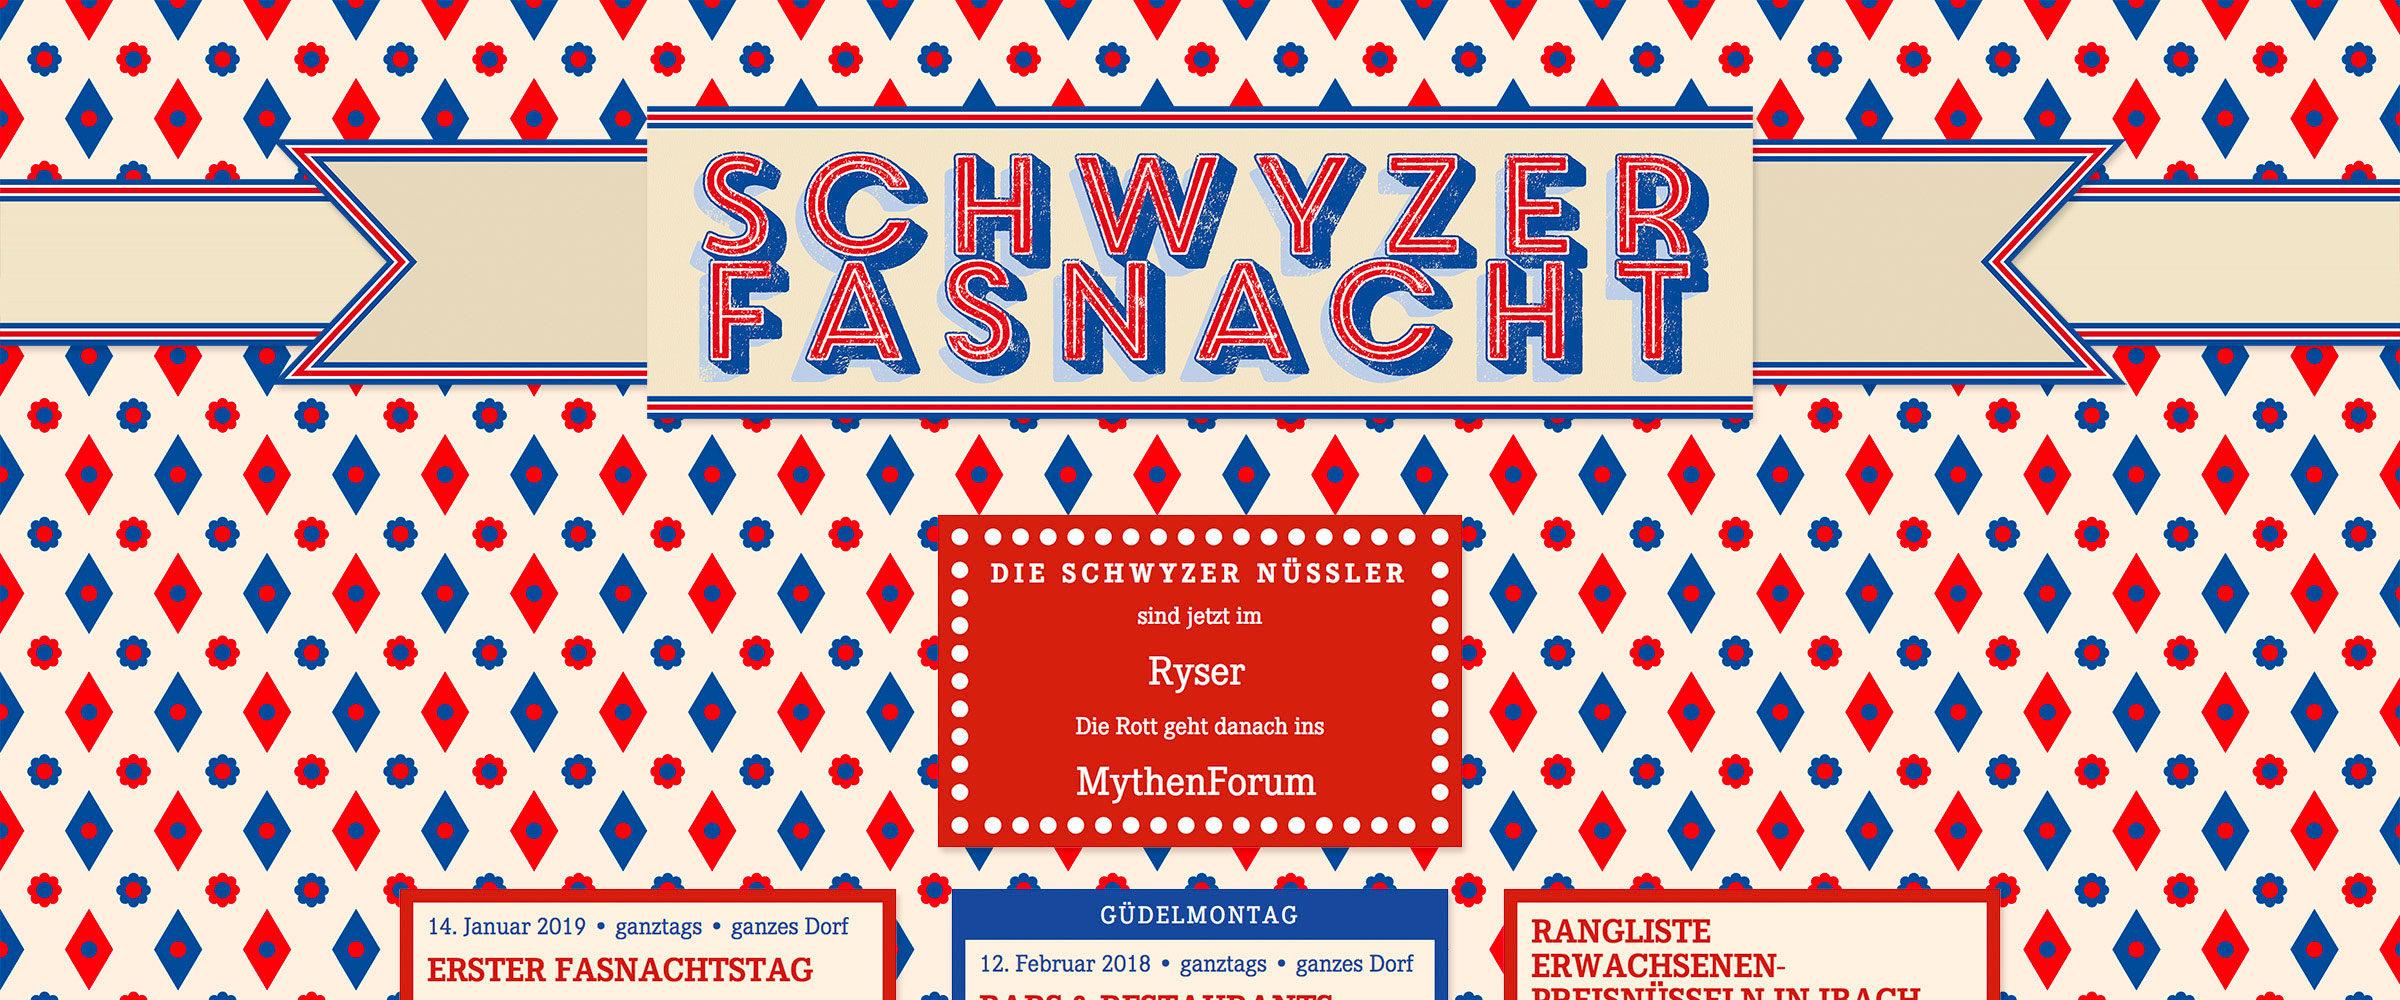 Schwyzer Fasnacht